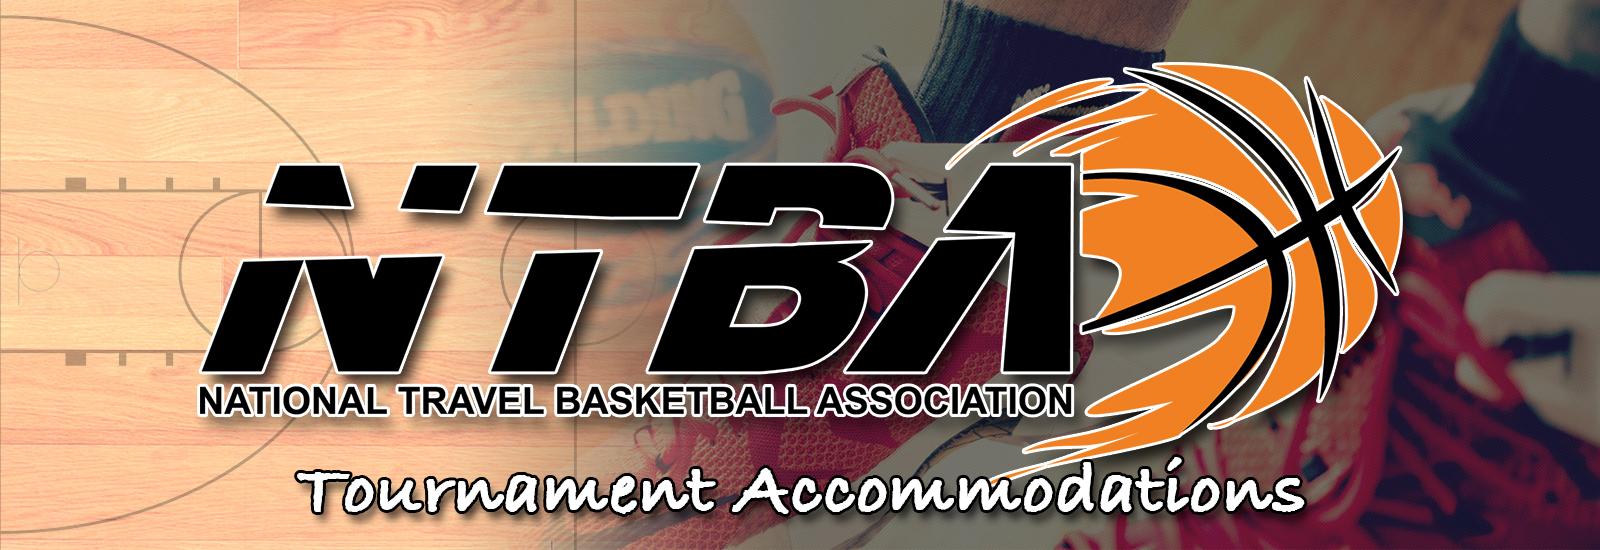 National Travel Basketball Association